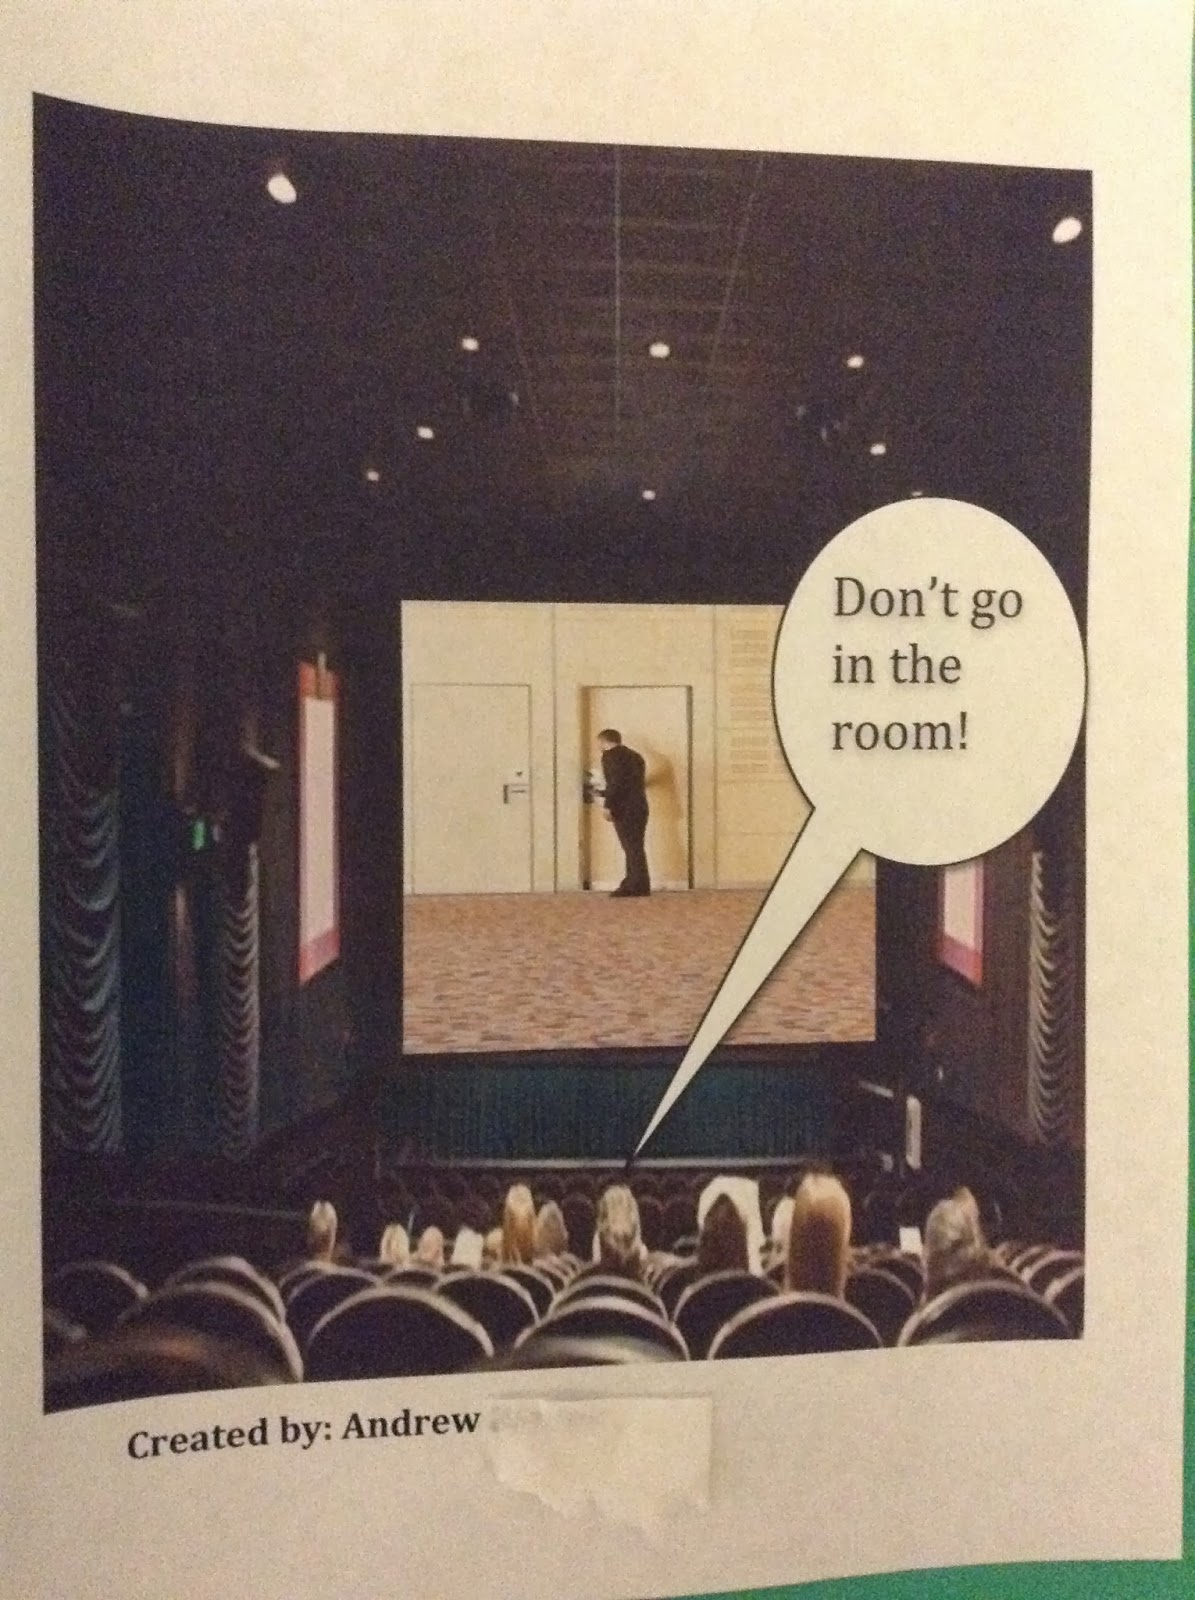 Mrs Jaffe S Bulletin Board Picturing Irony